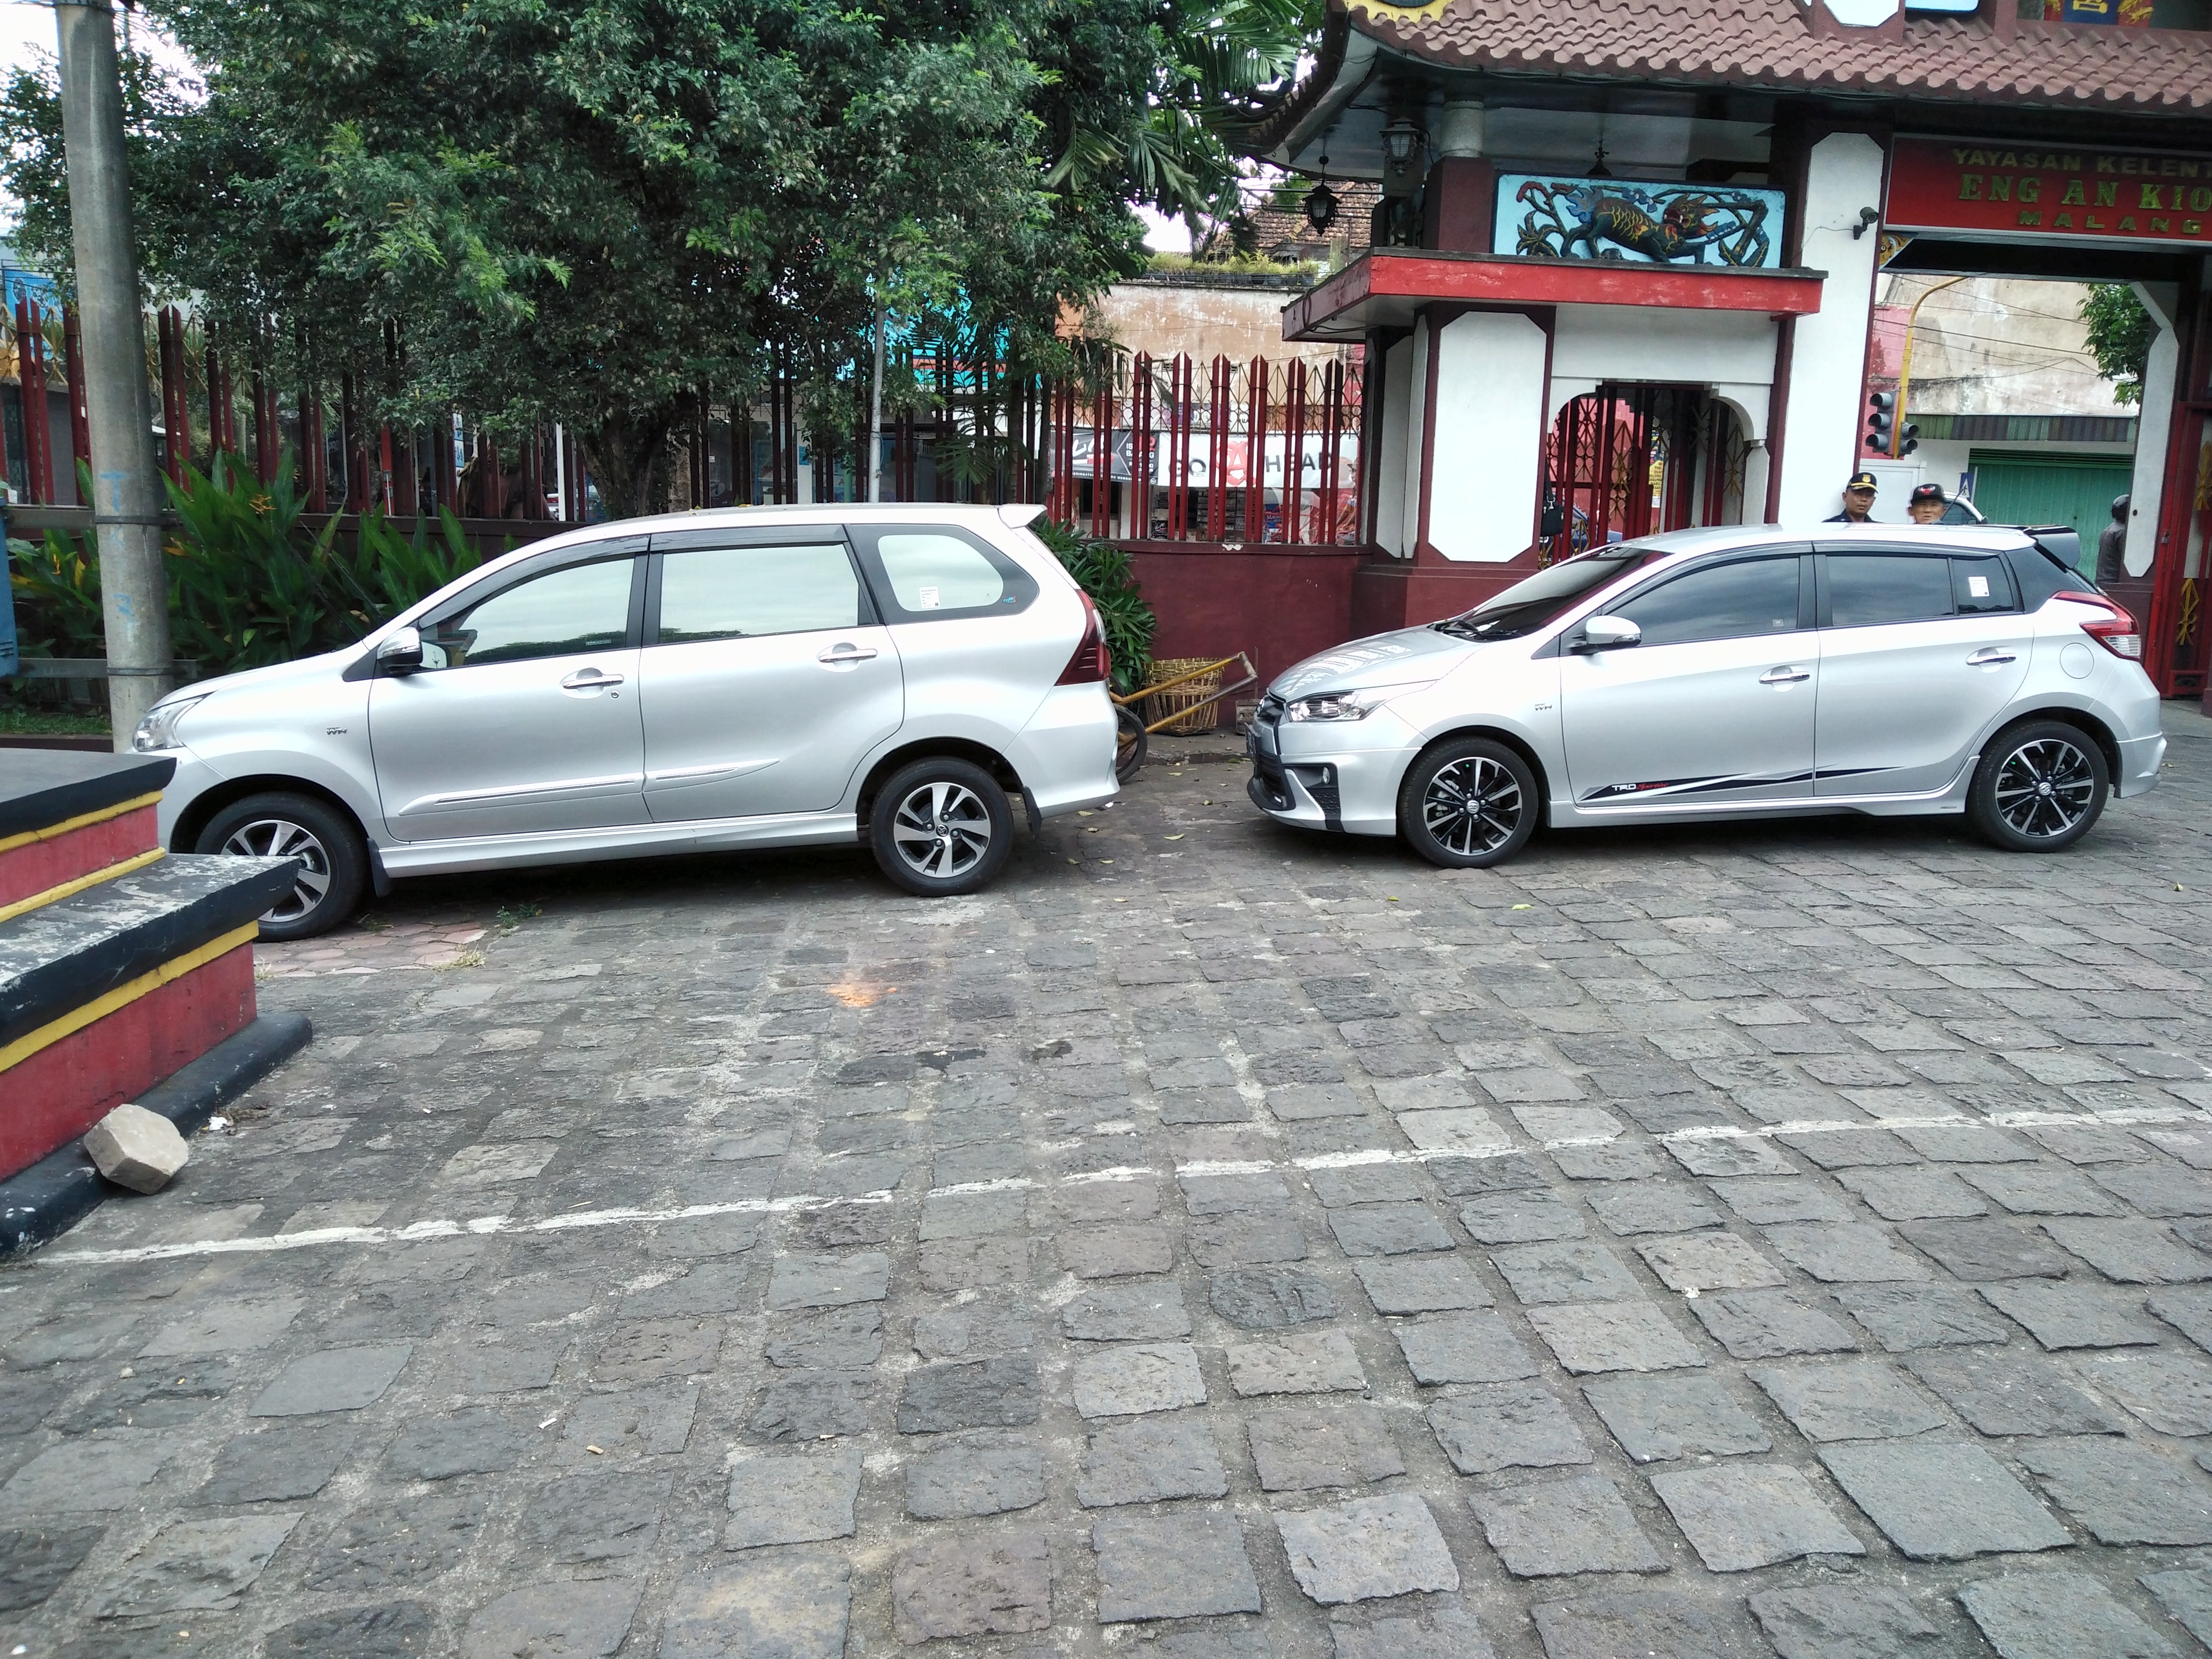 File:2017 Toyota Avanza 1.5 Veloz \u0026 Yaris TRD Sportivo (side), Malang